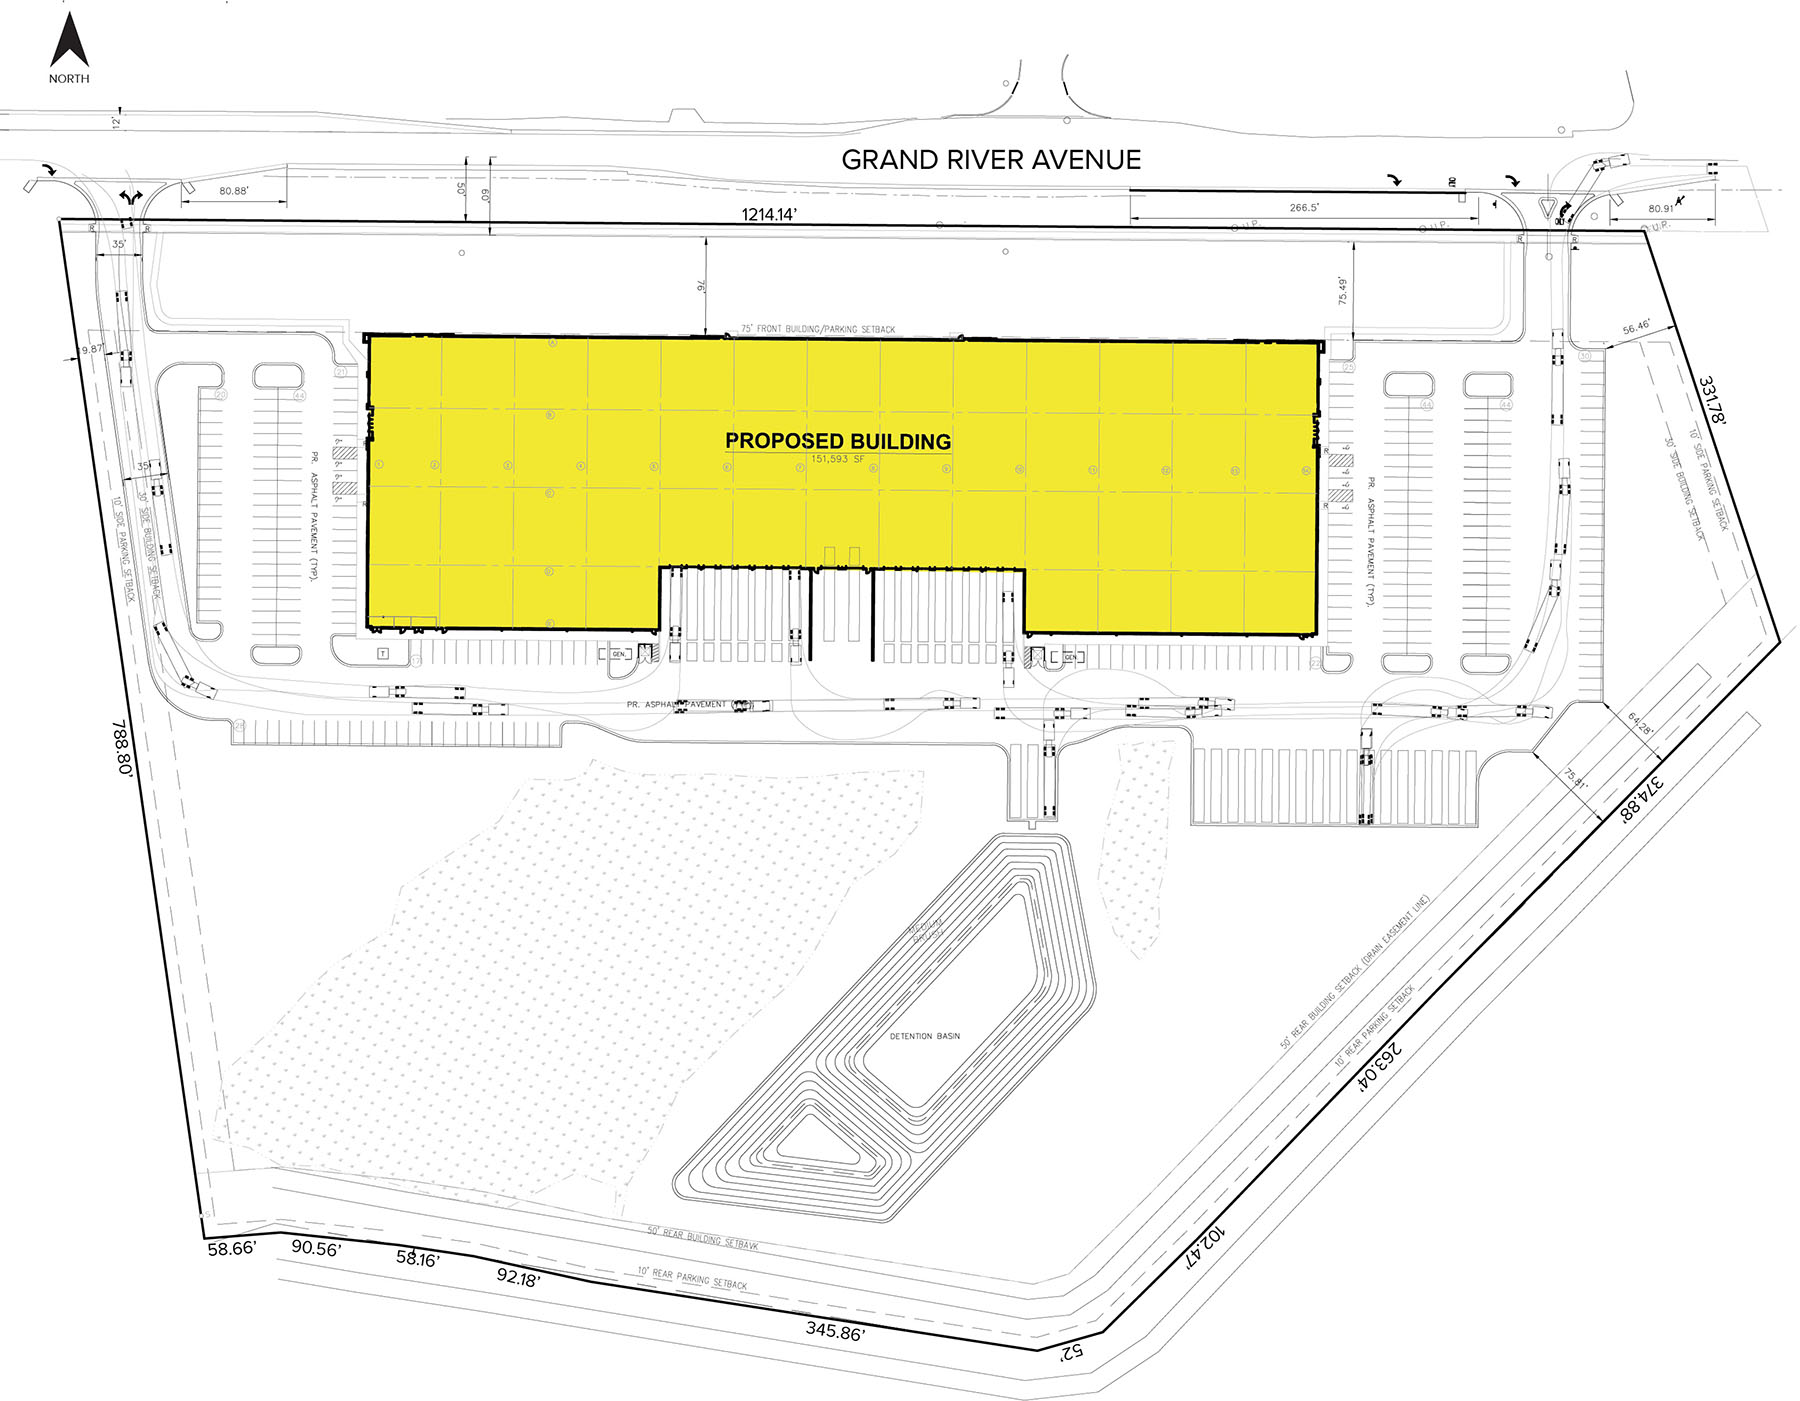 Lyon Twp_Grand River_LDCII plan_overall